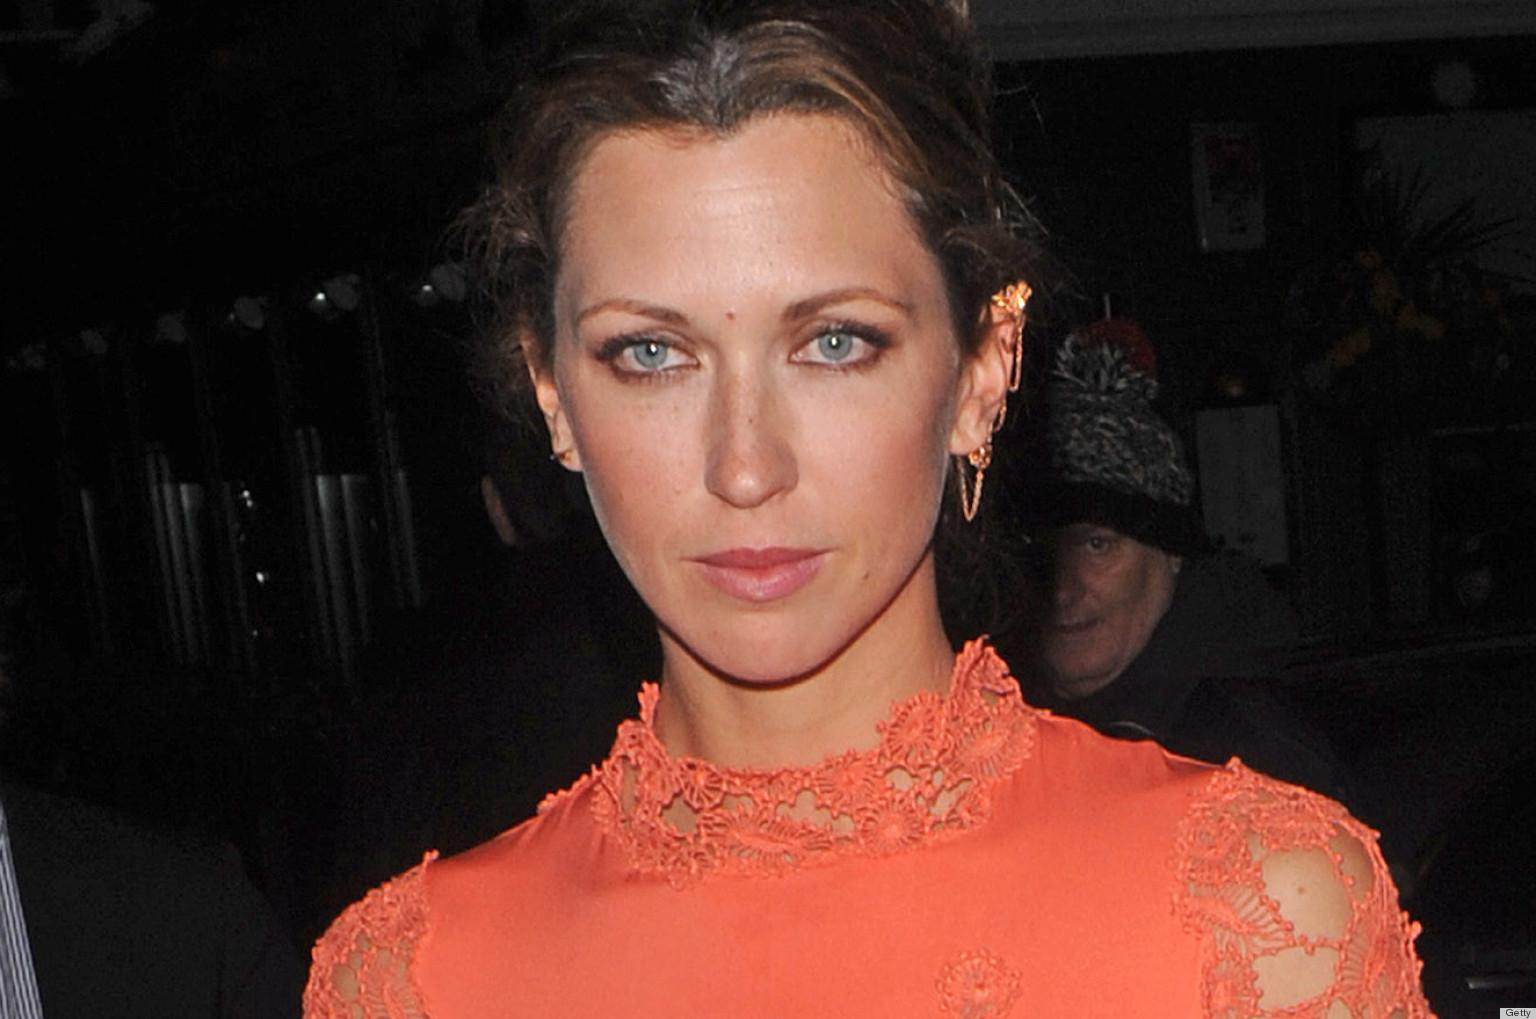 Alyson Hannigan born March 24, 1974 (age 44),Chrissy Metz Adult pictures Livinia Nixon,Deanna Russo